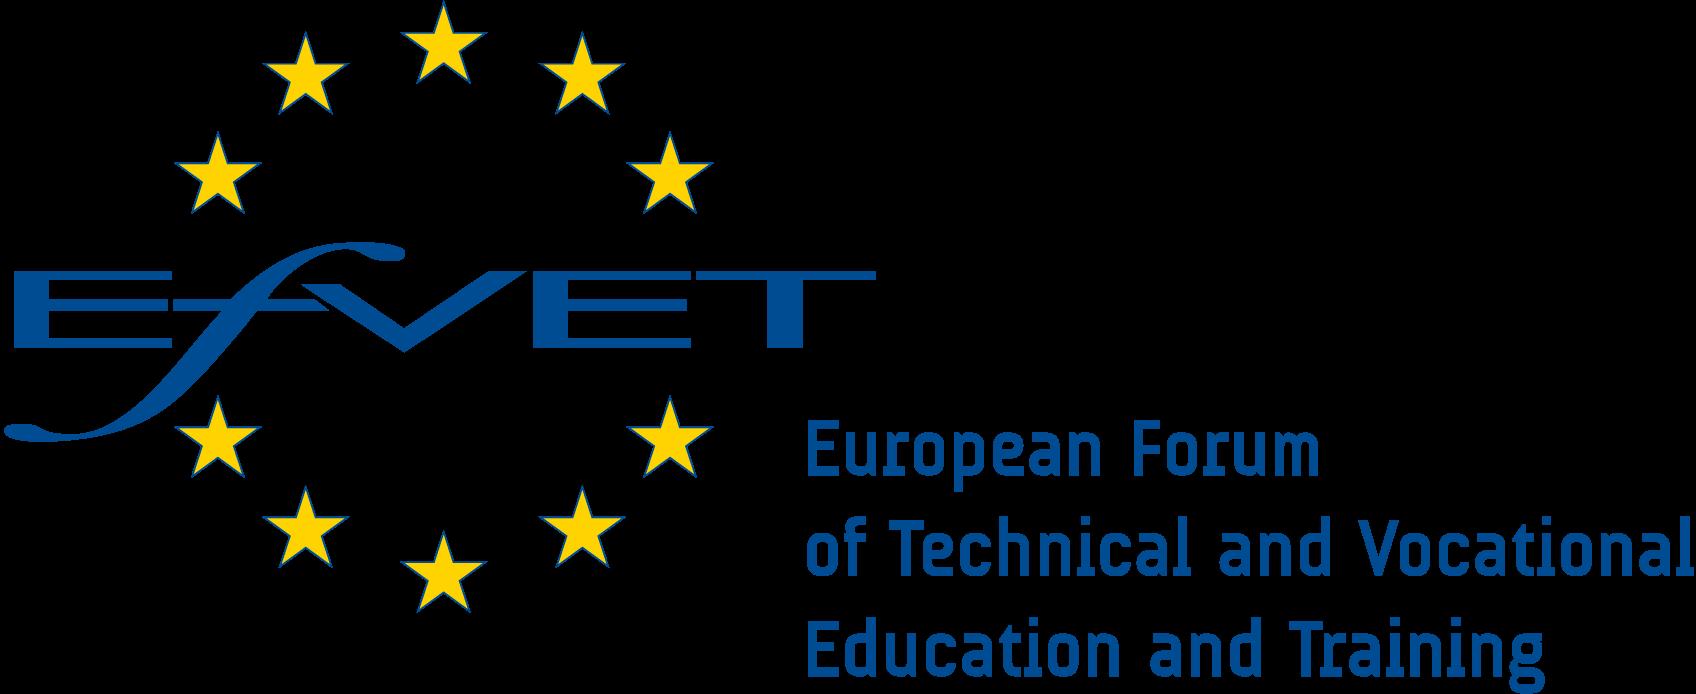 European Forum for Vocational Education & Training